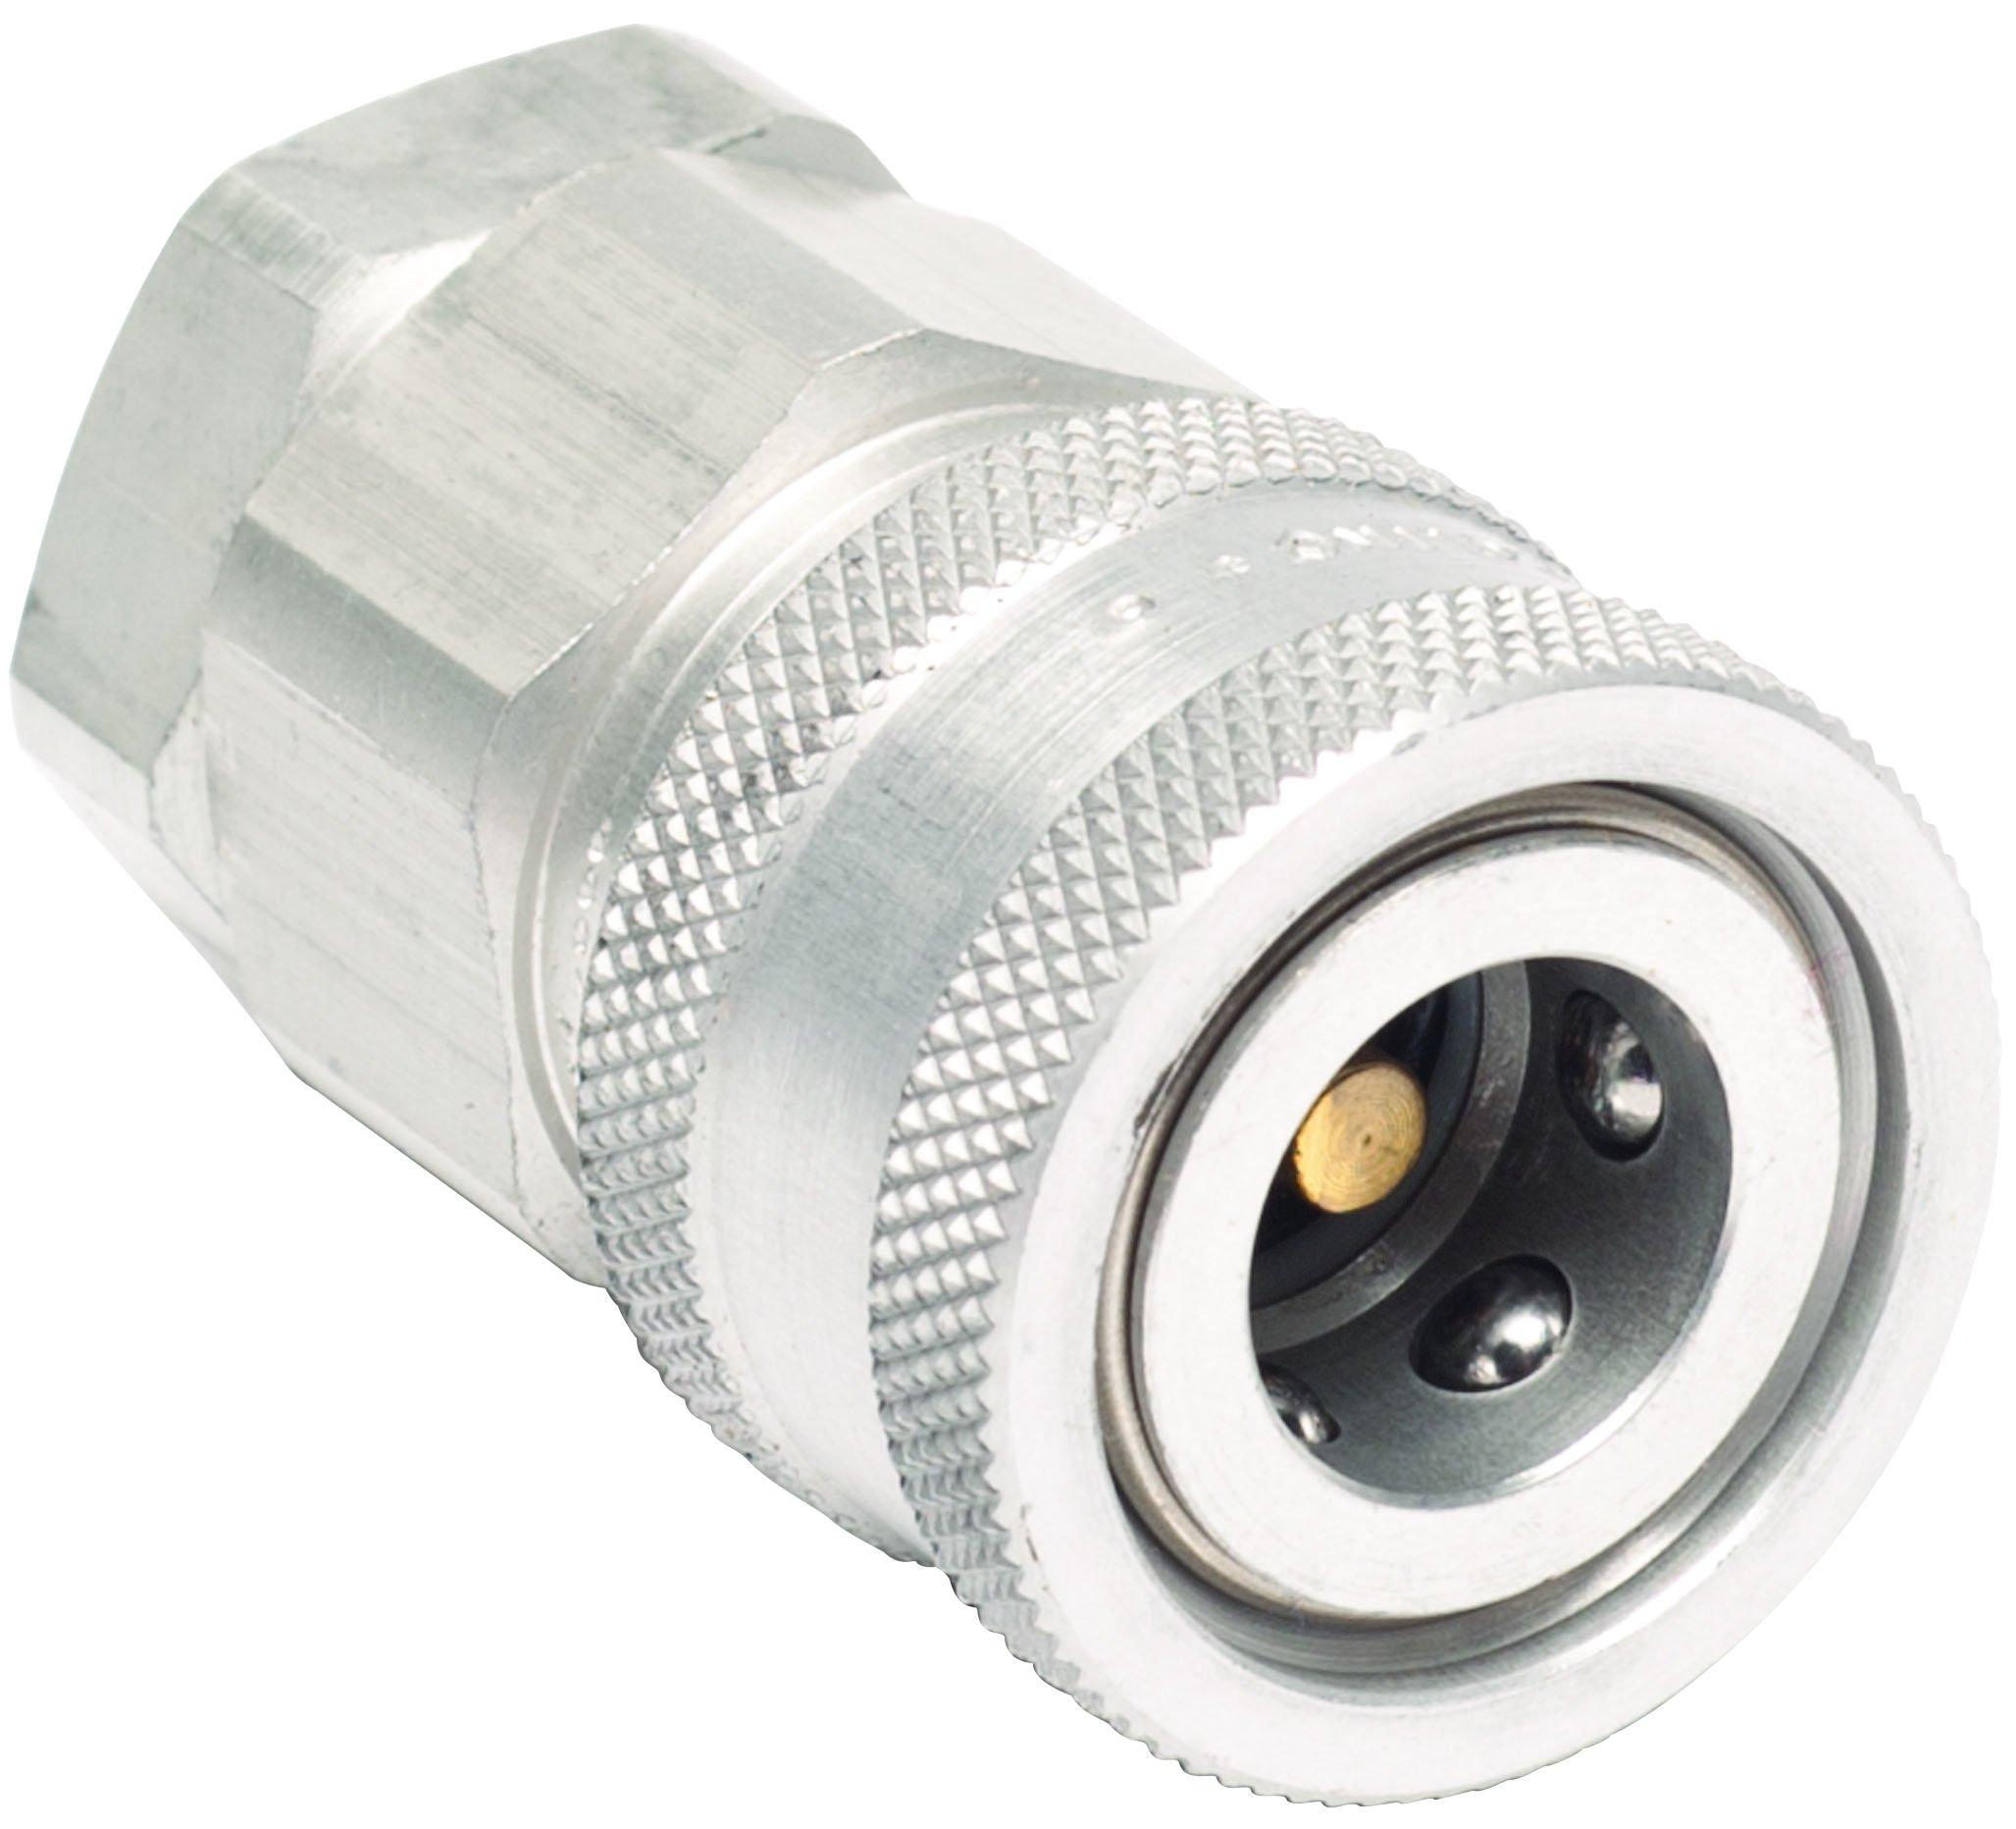 MSA 66272 Aluminum 1/4 NPT Female Socket, Snap-Tite